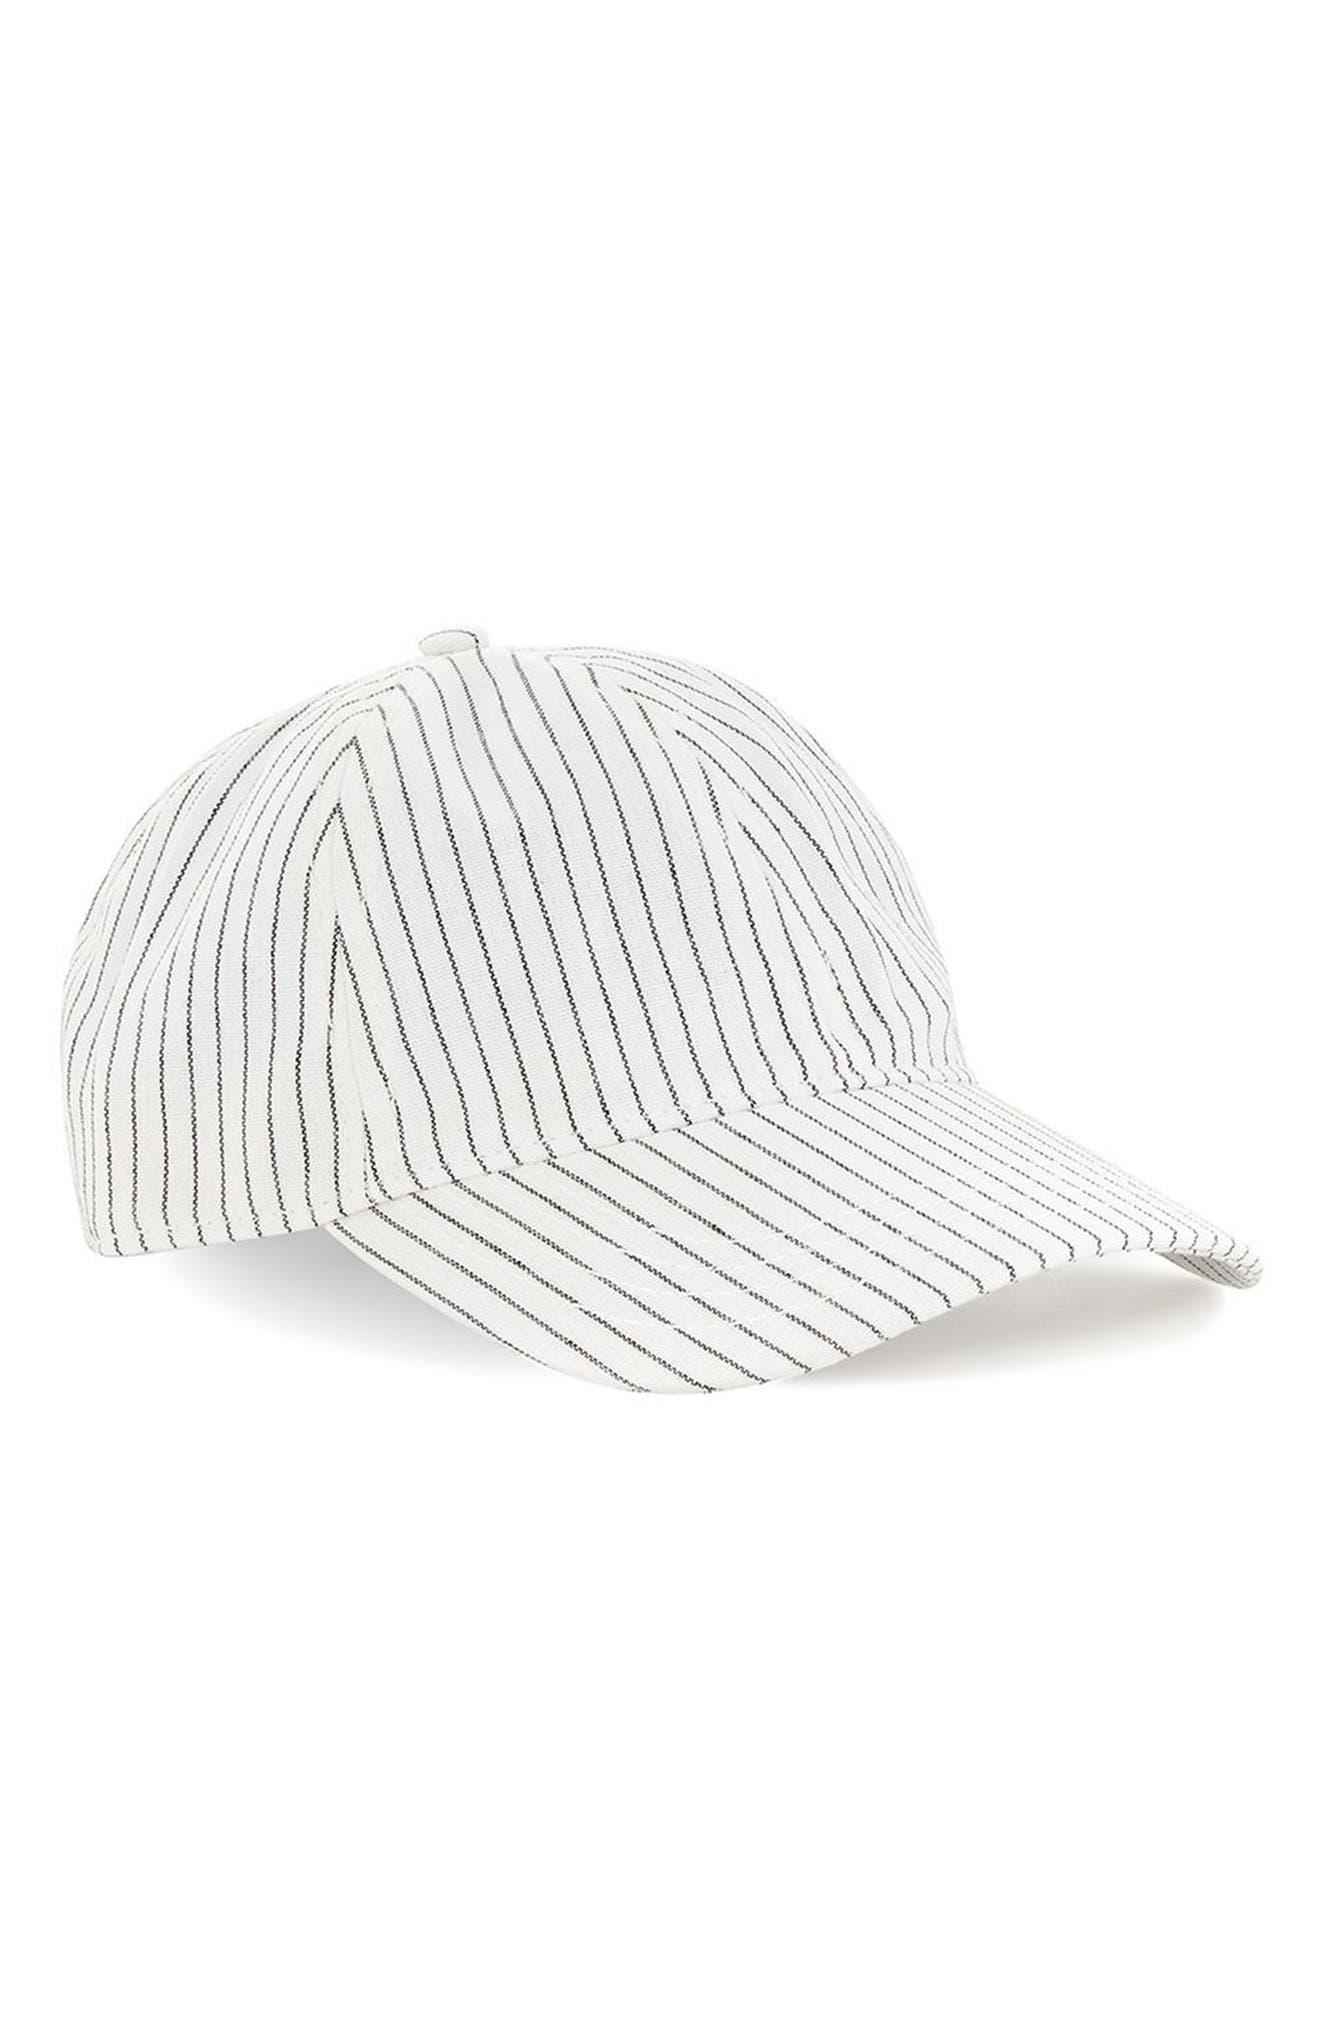 Stripe Boys Curved Peak Cap,                         Main,                         color, White Multi